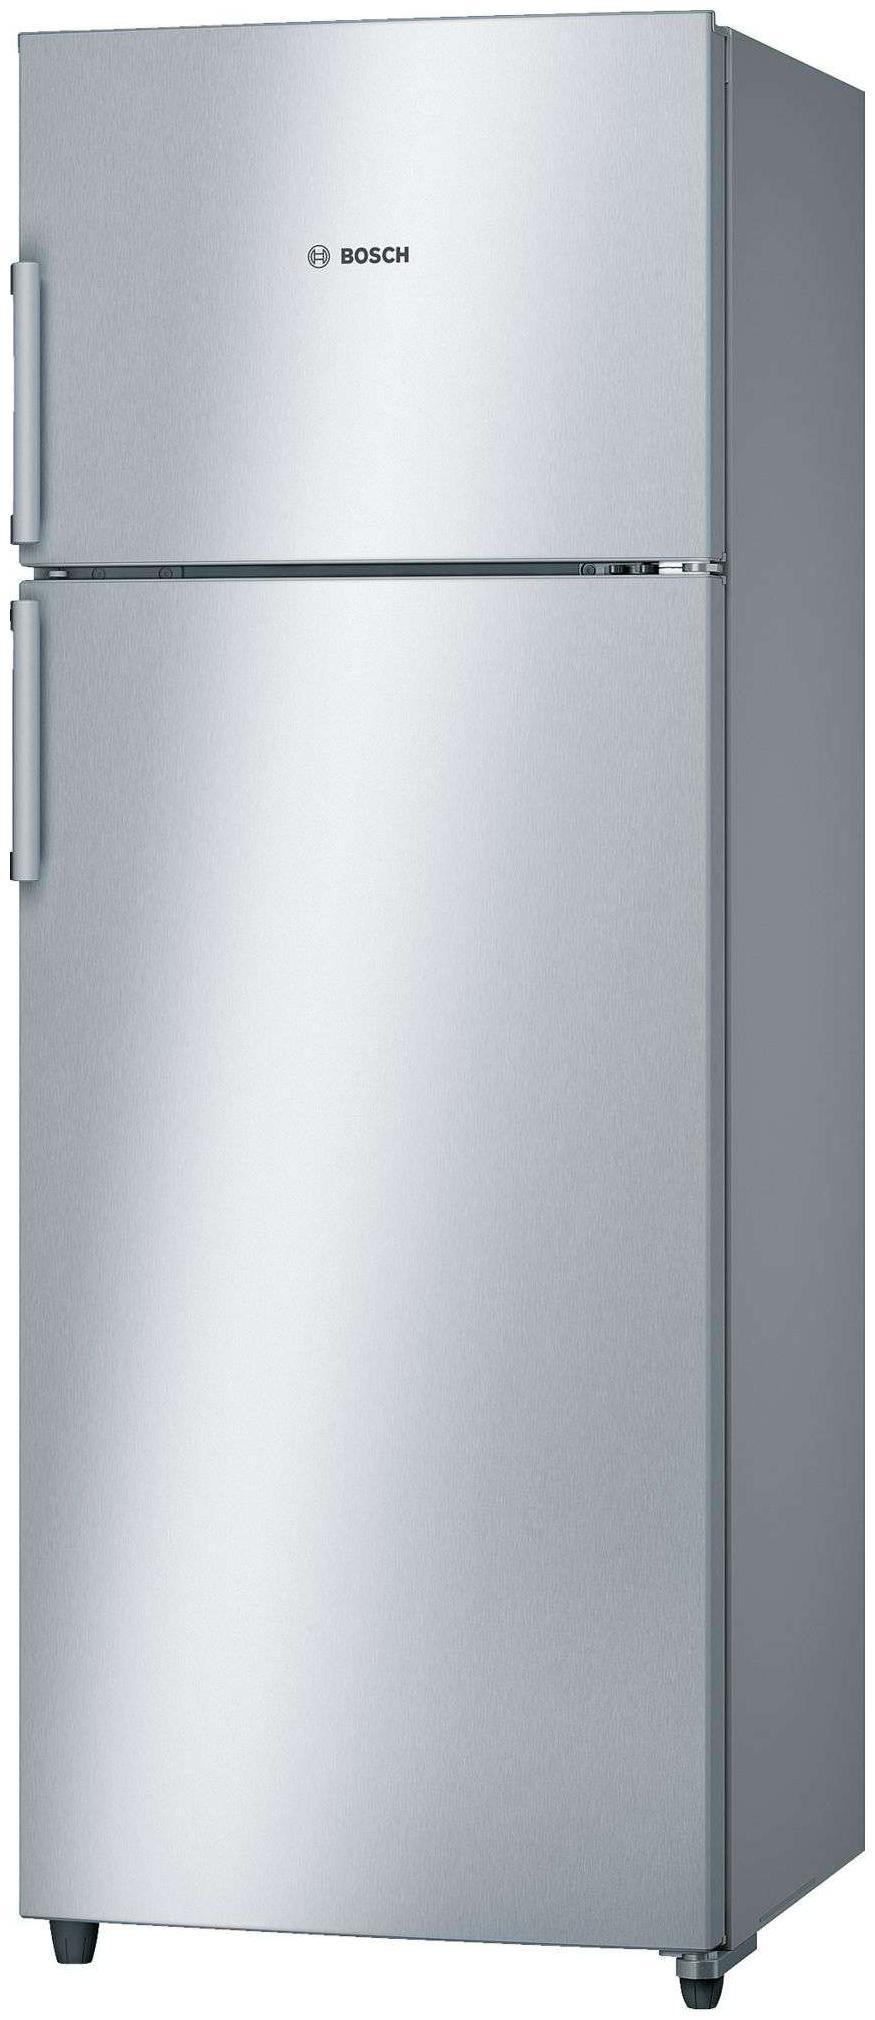 Bosch 347 L Direct Cool Double Door 4 Star Refrigerator (KDN43VL40I, Silver)